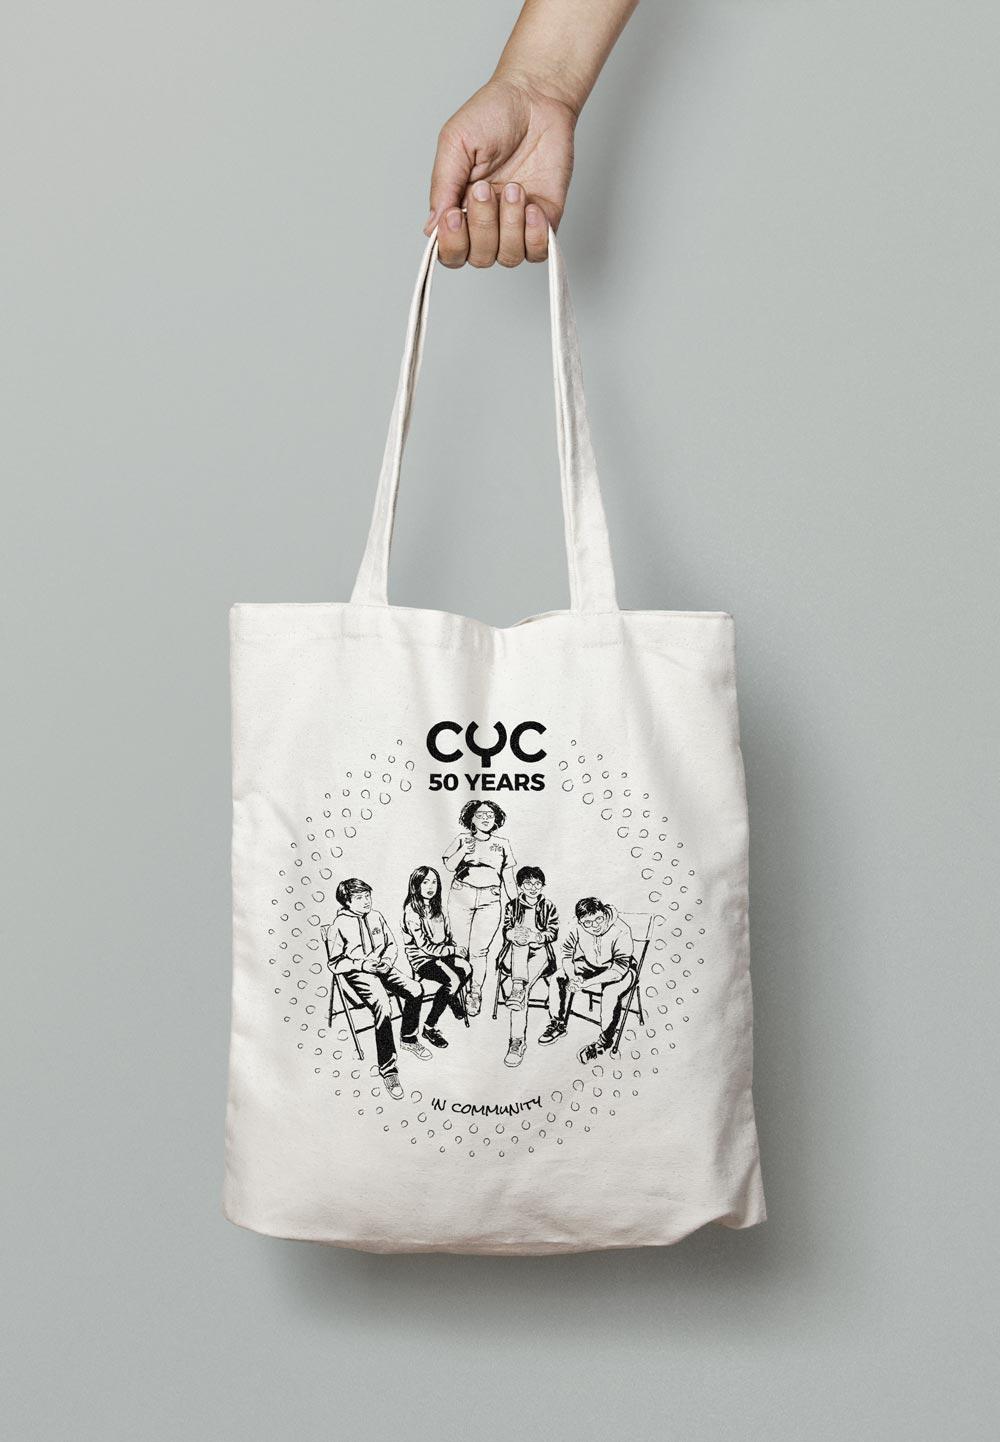 CYC Canvas Tote Bag